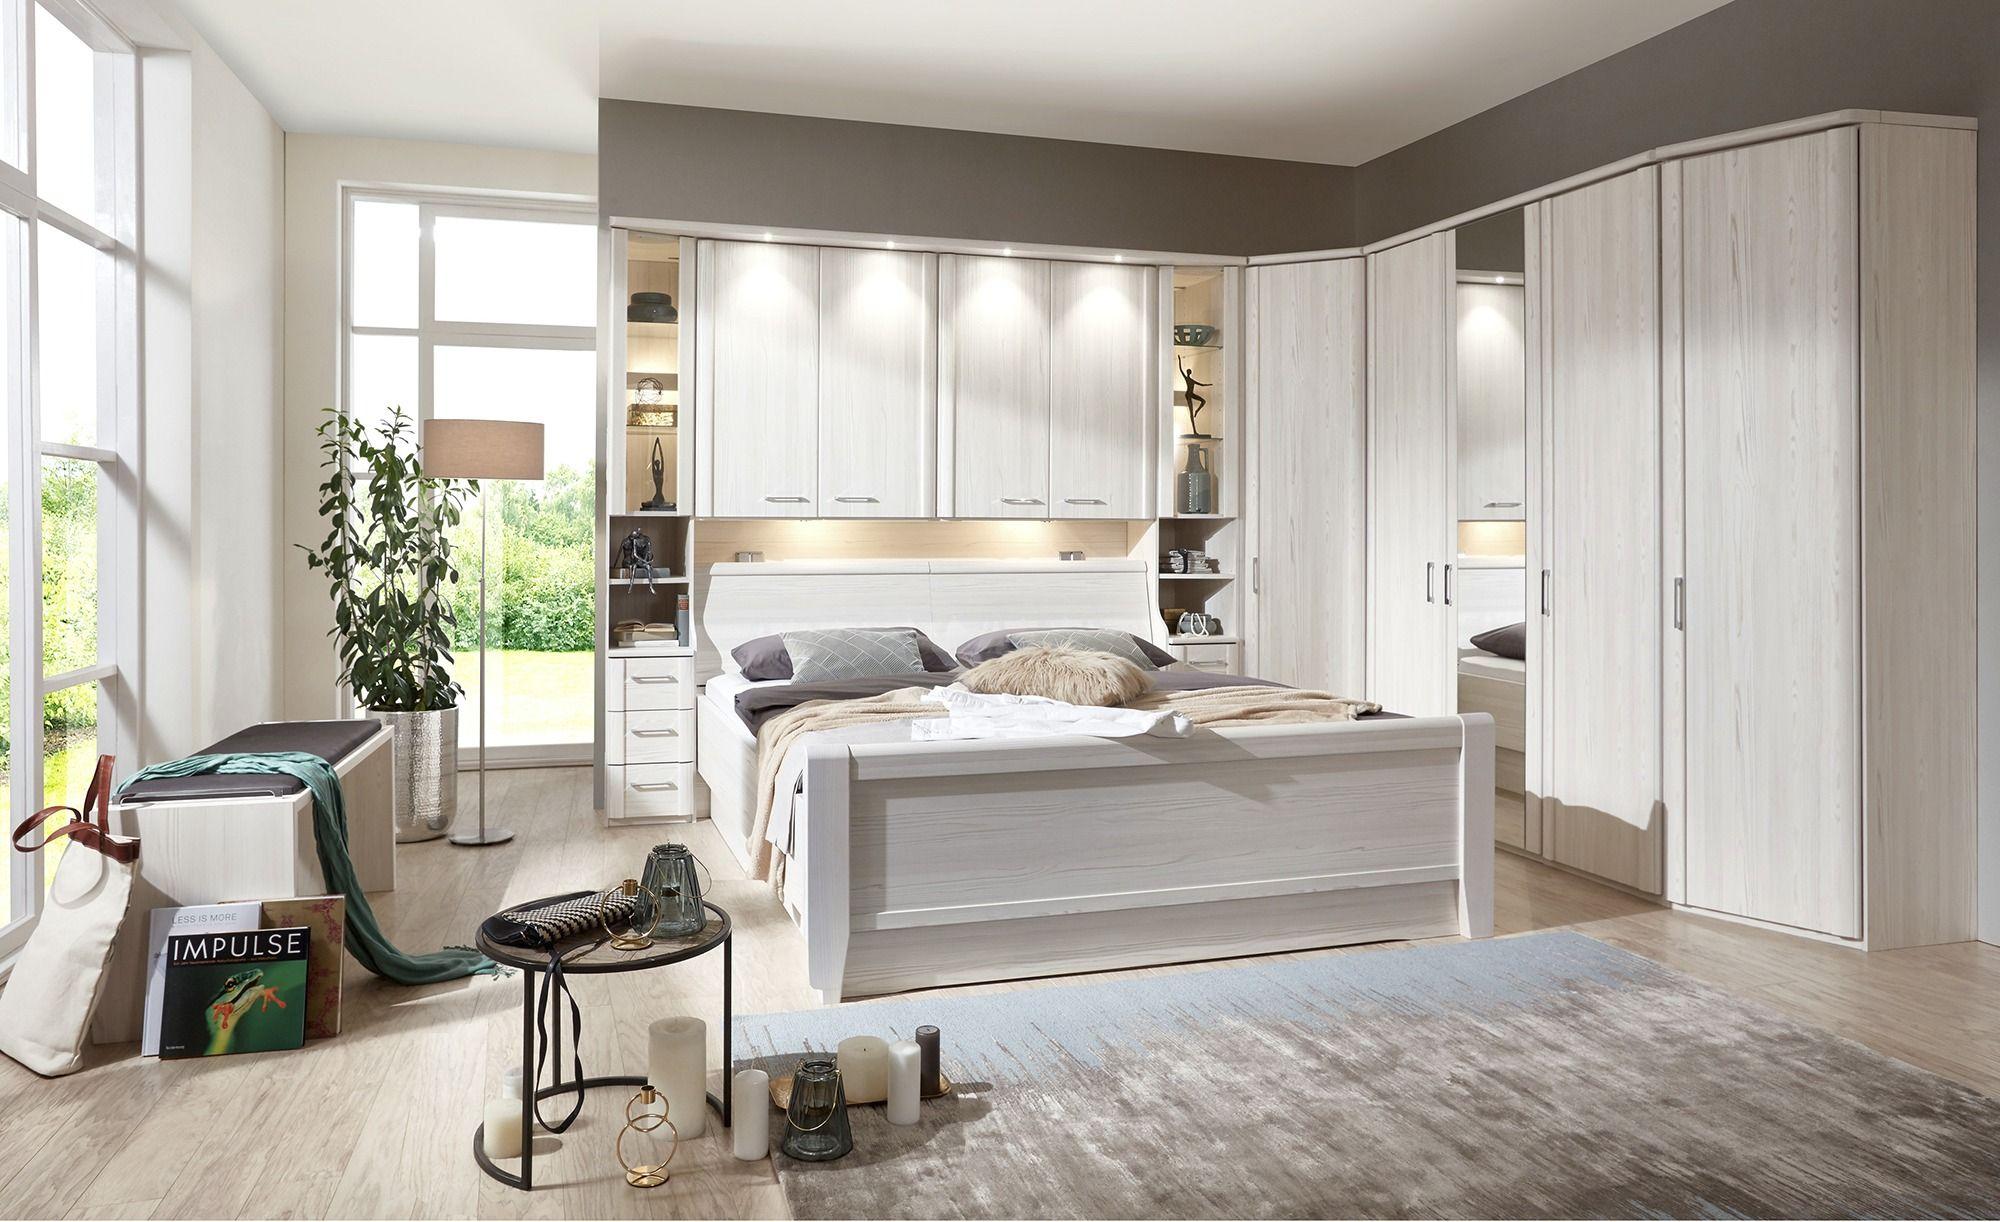 Gray Jones Sofa 4 Sitzig Straton Schlafzimmer Set Komplettes Schlafzimmer Schlafzimmer Kaufen